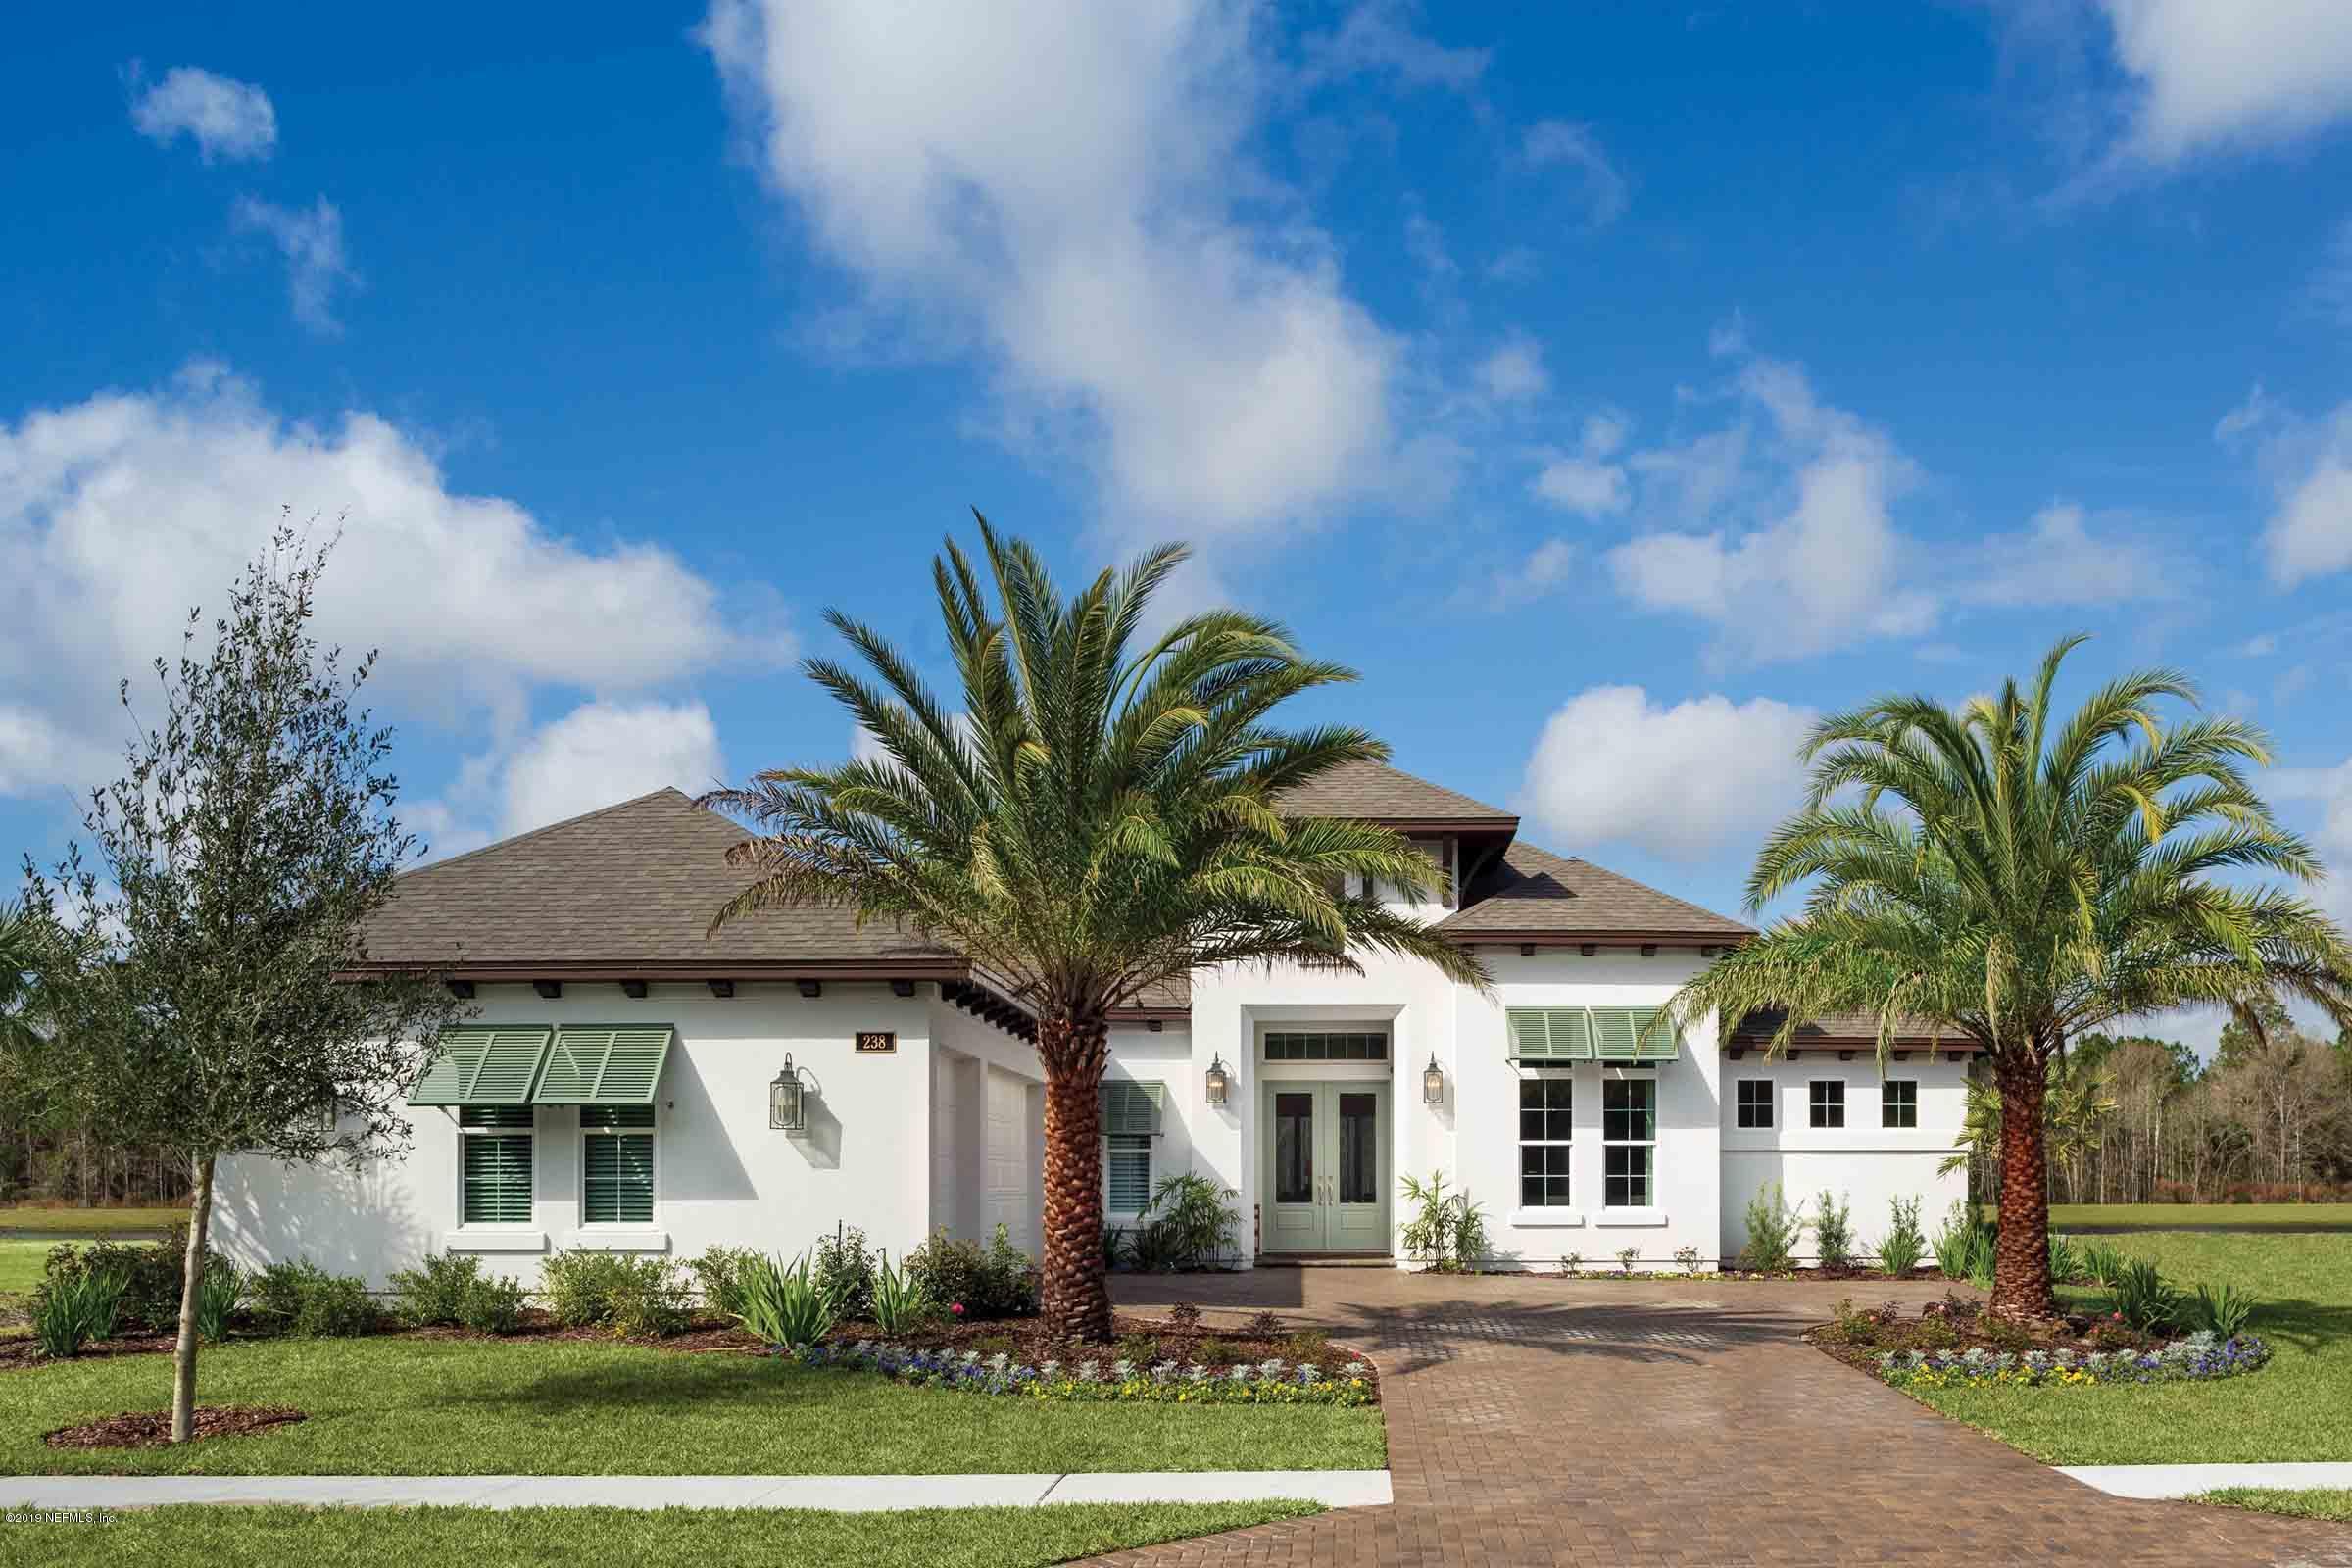 35A SAN CRISTOBAL, ST AUGUSTINE, FLORIDA 32095, 3 Bedrooms Bedrooms, ,3 BathroomsBathrooms,Residential - single family,For sale,SAN CRISTOBAL,996410